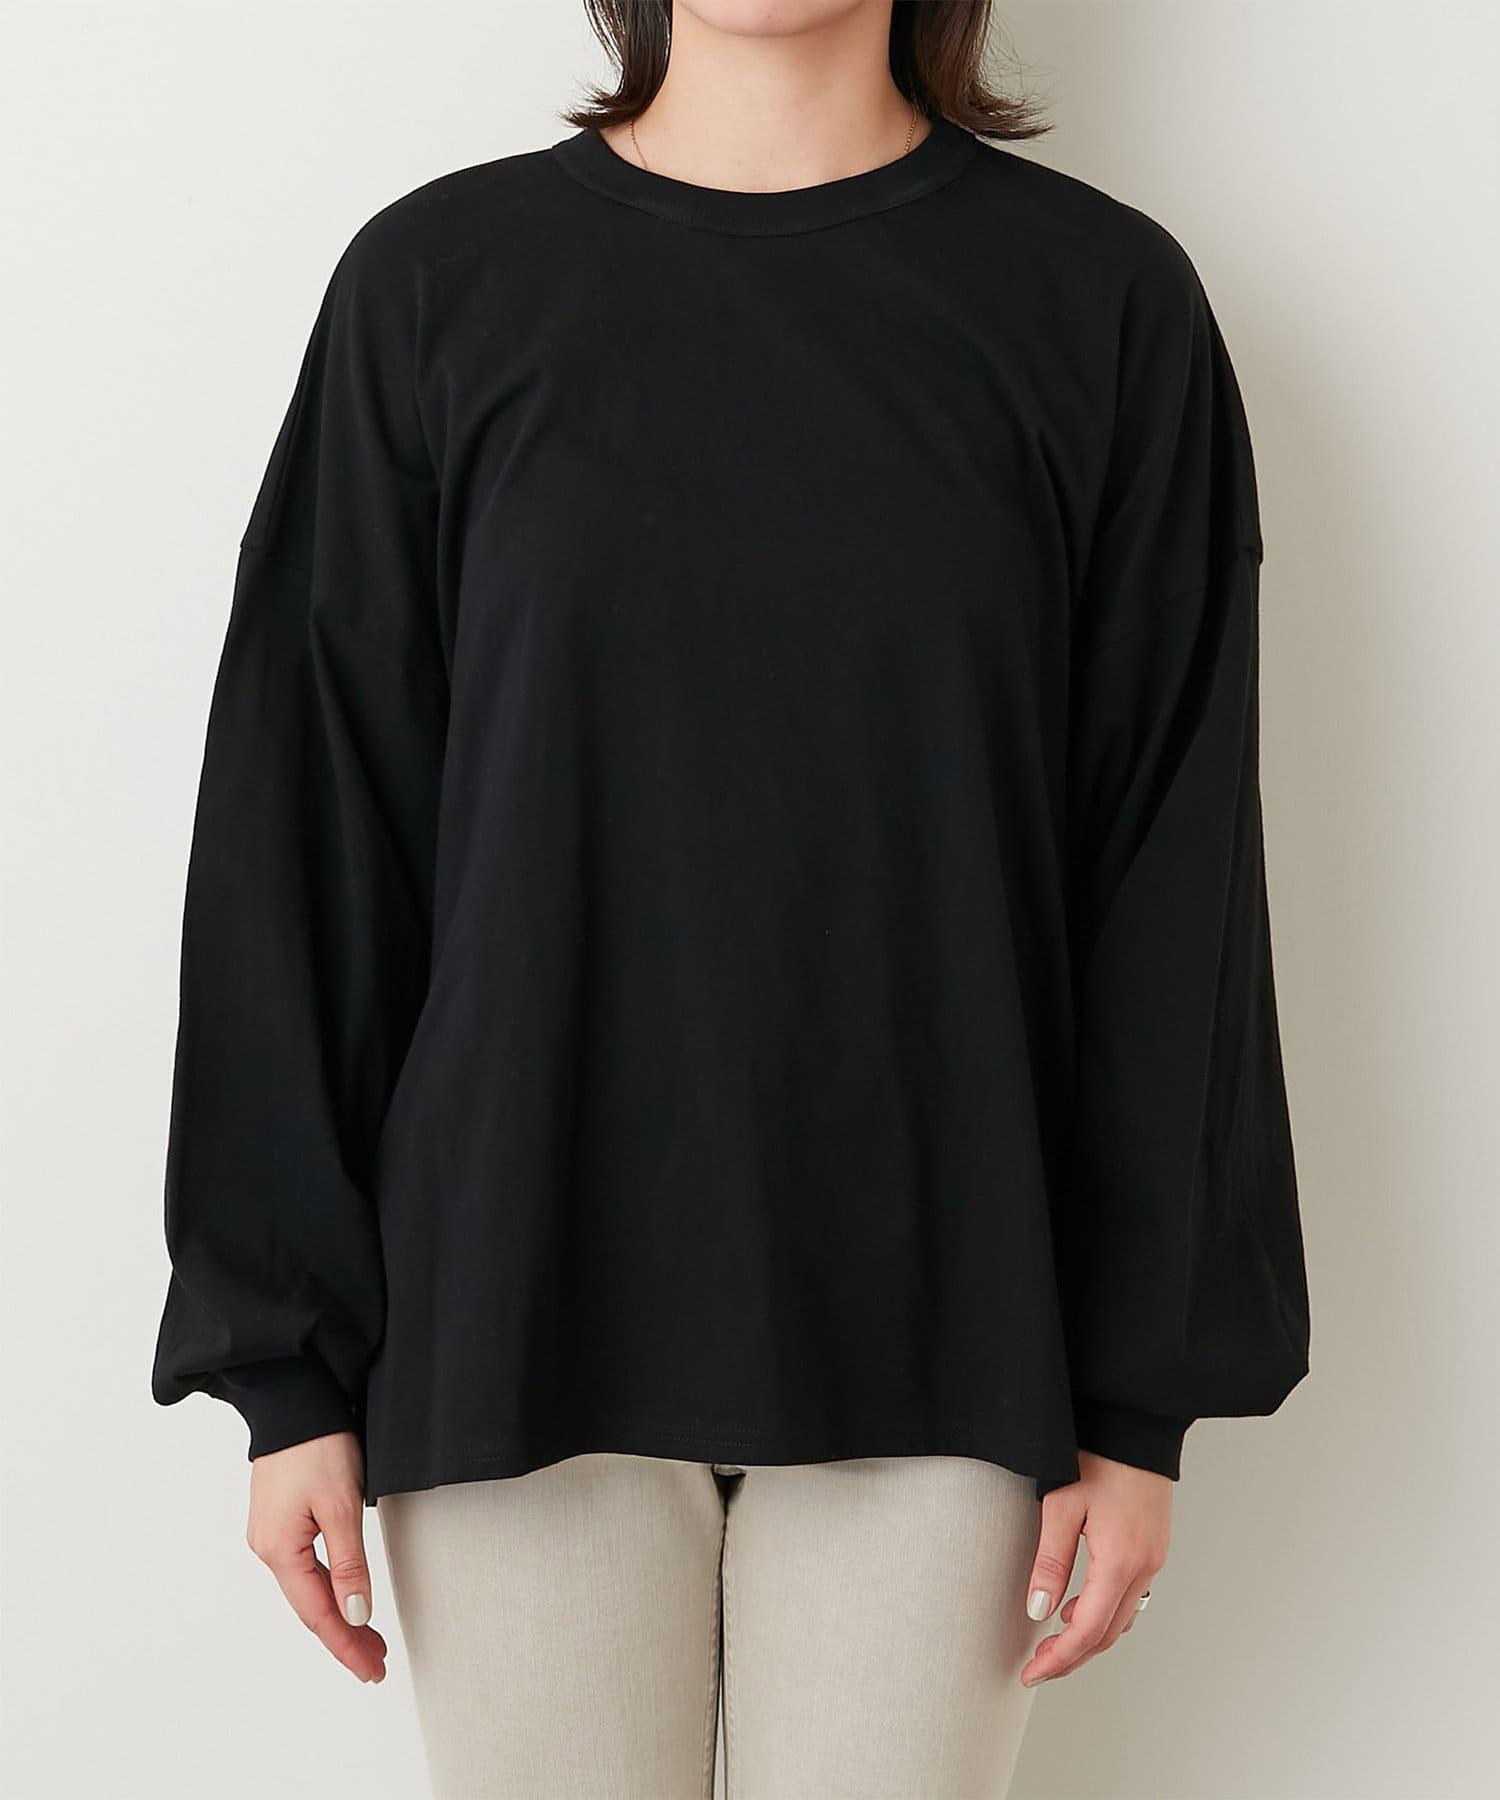 GALLARDAGALANTE(ガリャルダガランテ) バックオープンロングTシャツ【オンラインストア限定商品】